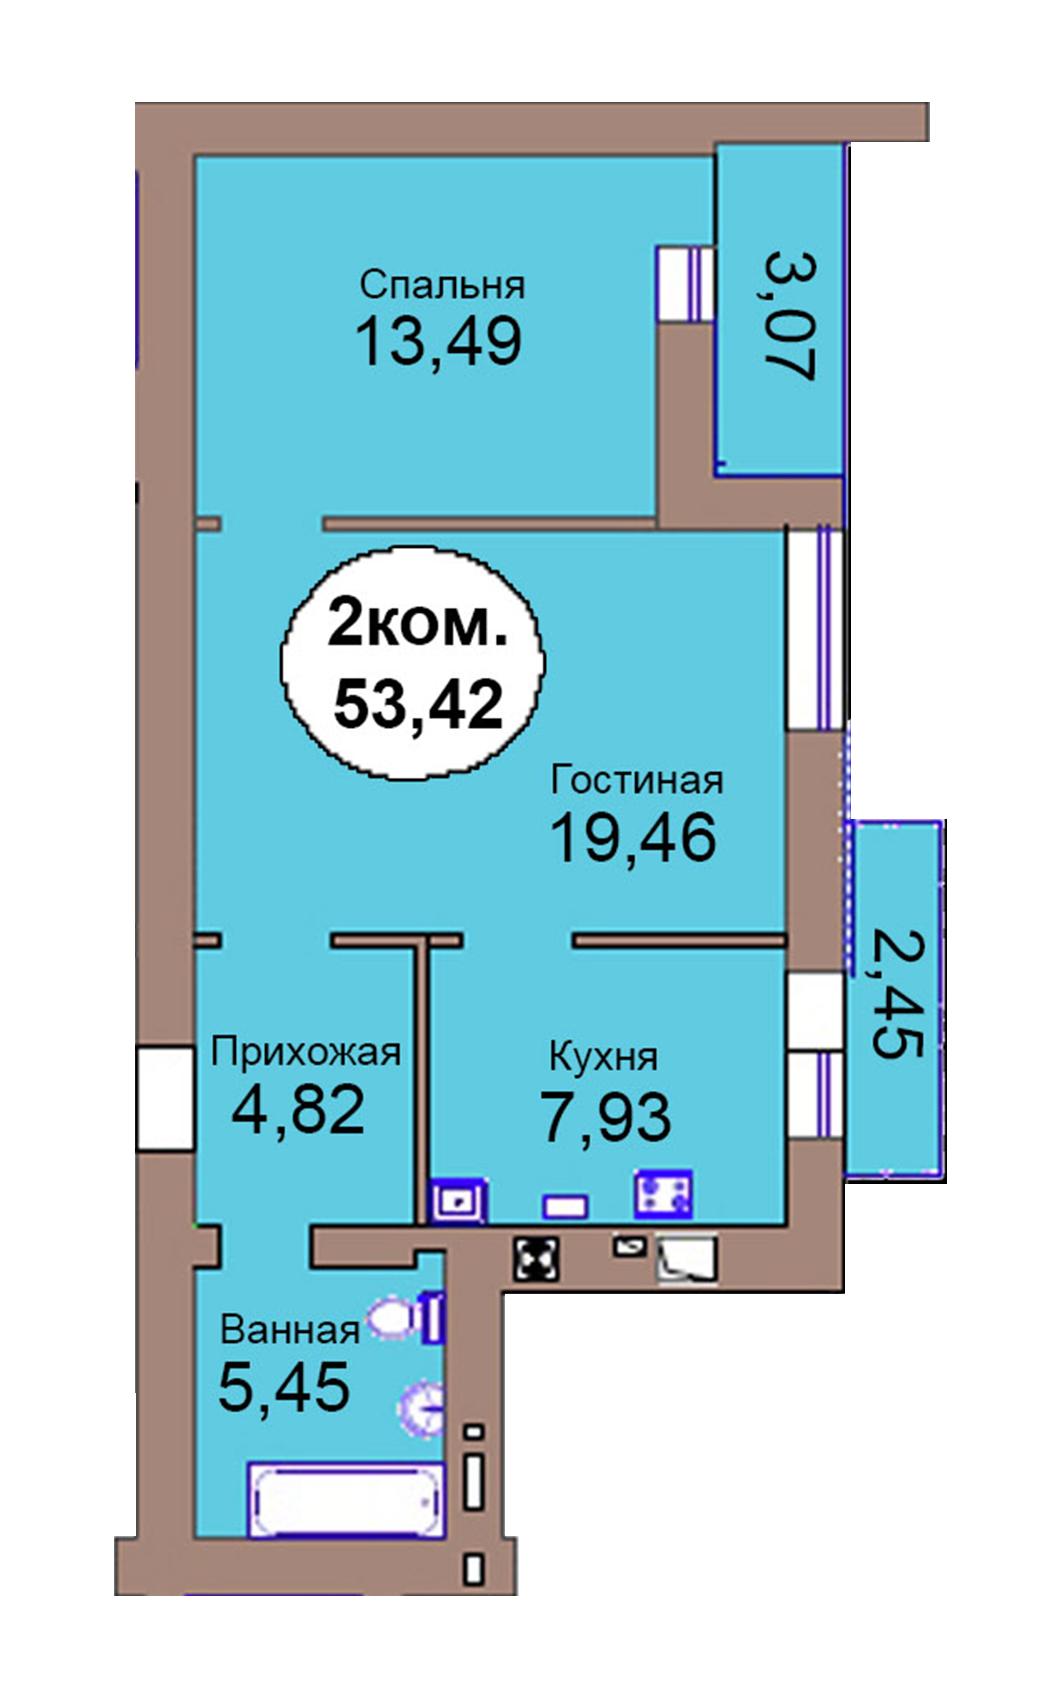 2-комн. кв. по пер. Калининградский, 4  кв. 108 в Калининграде